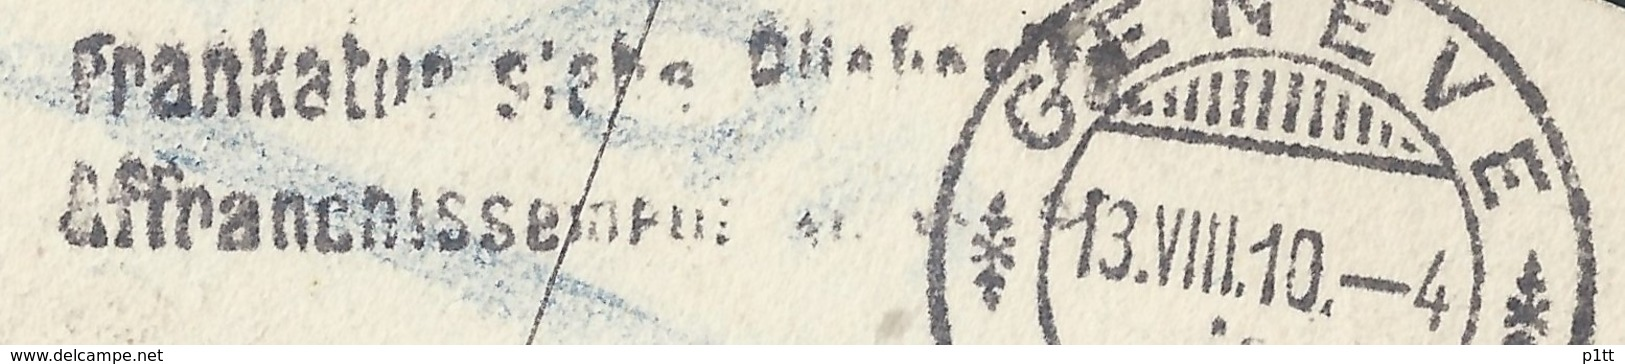 "A27 ""Geneva And Mont Blanc"" Post 1910 Geneva (Switzerland) Pavlovsk (Russia). Passage Of Mail Without Postage Stamps. Ra - Switzerland"